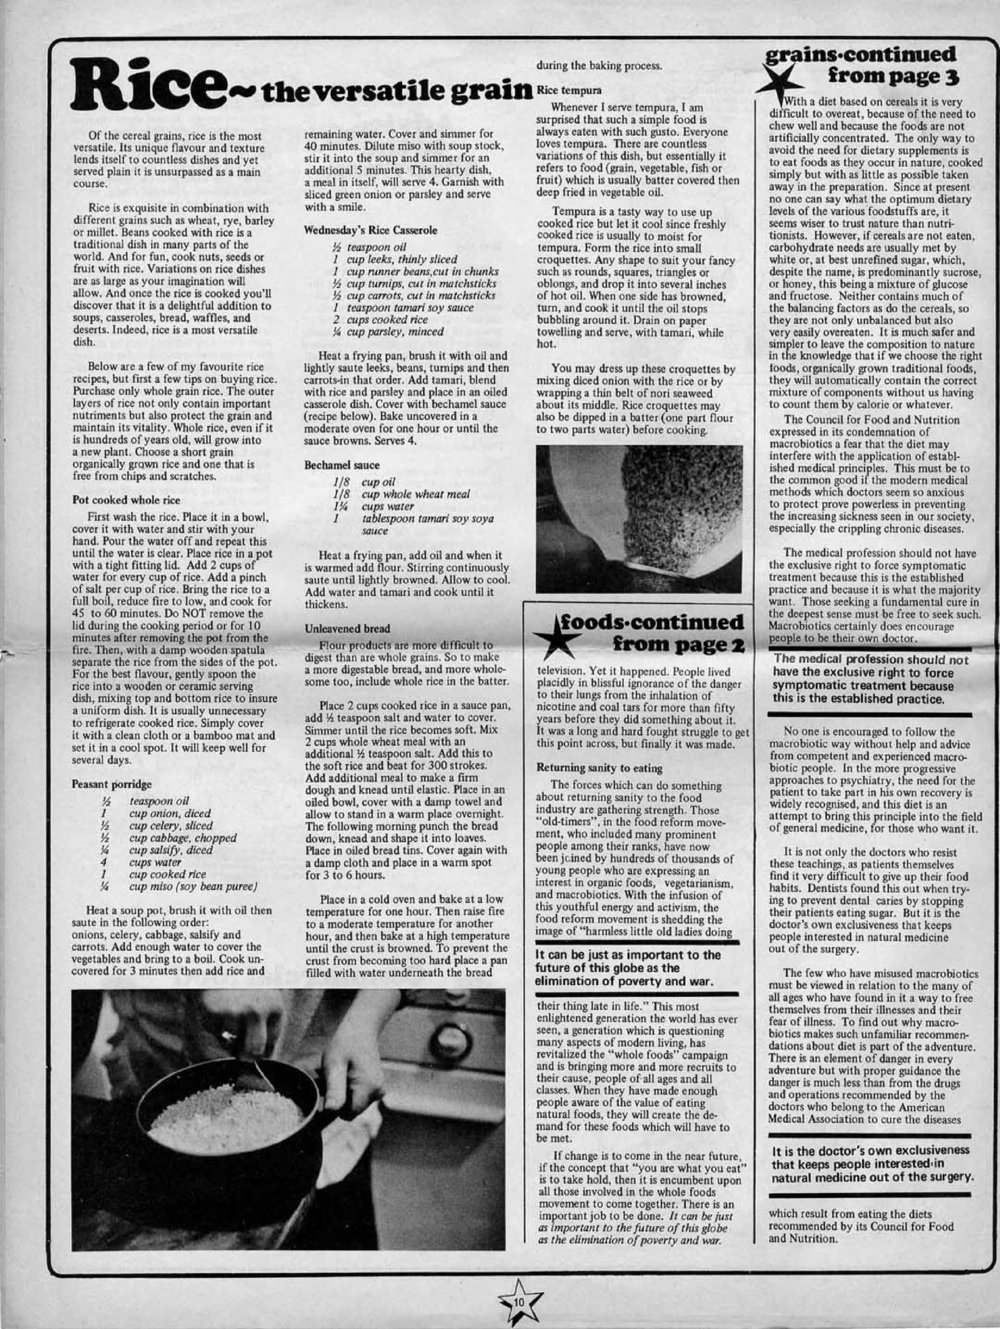 seed-v1-n1-nov1971 (1)-10.jpg